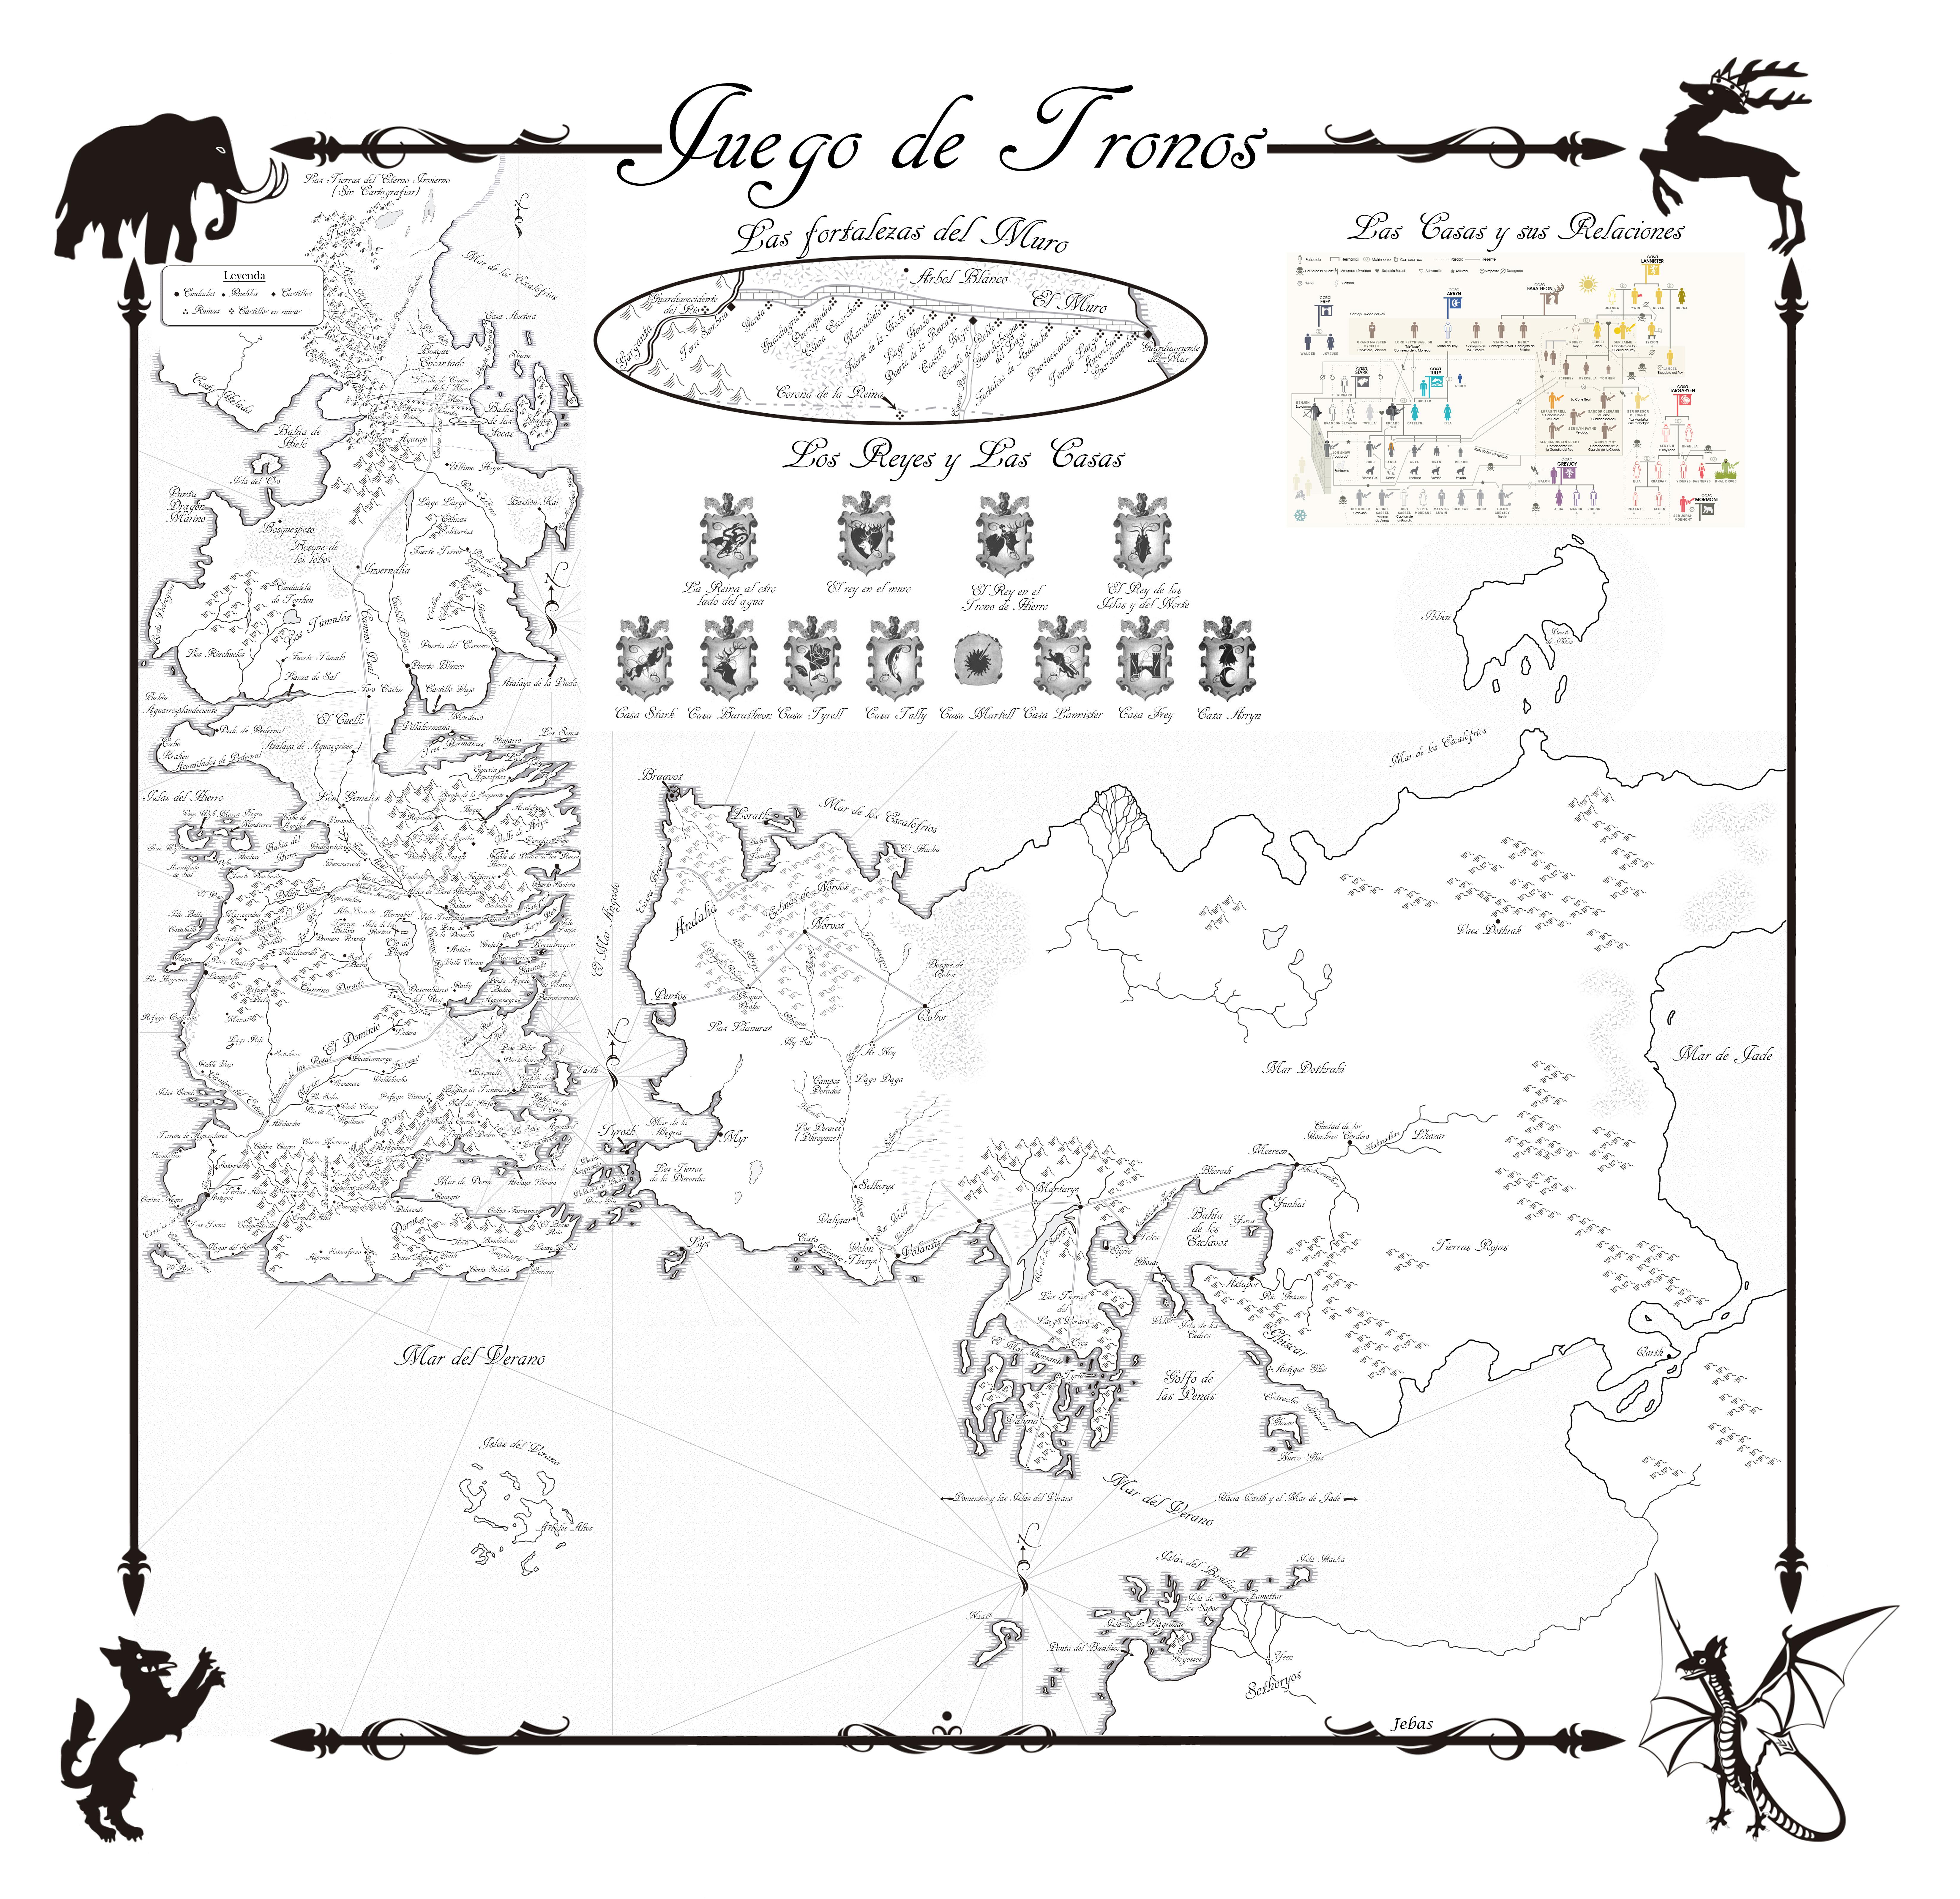 Mapa en español de JUEGO DE TRONOS